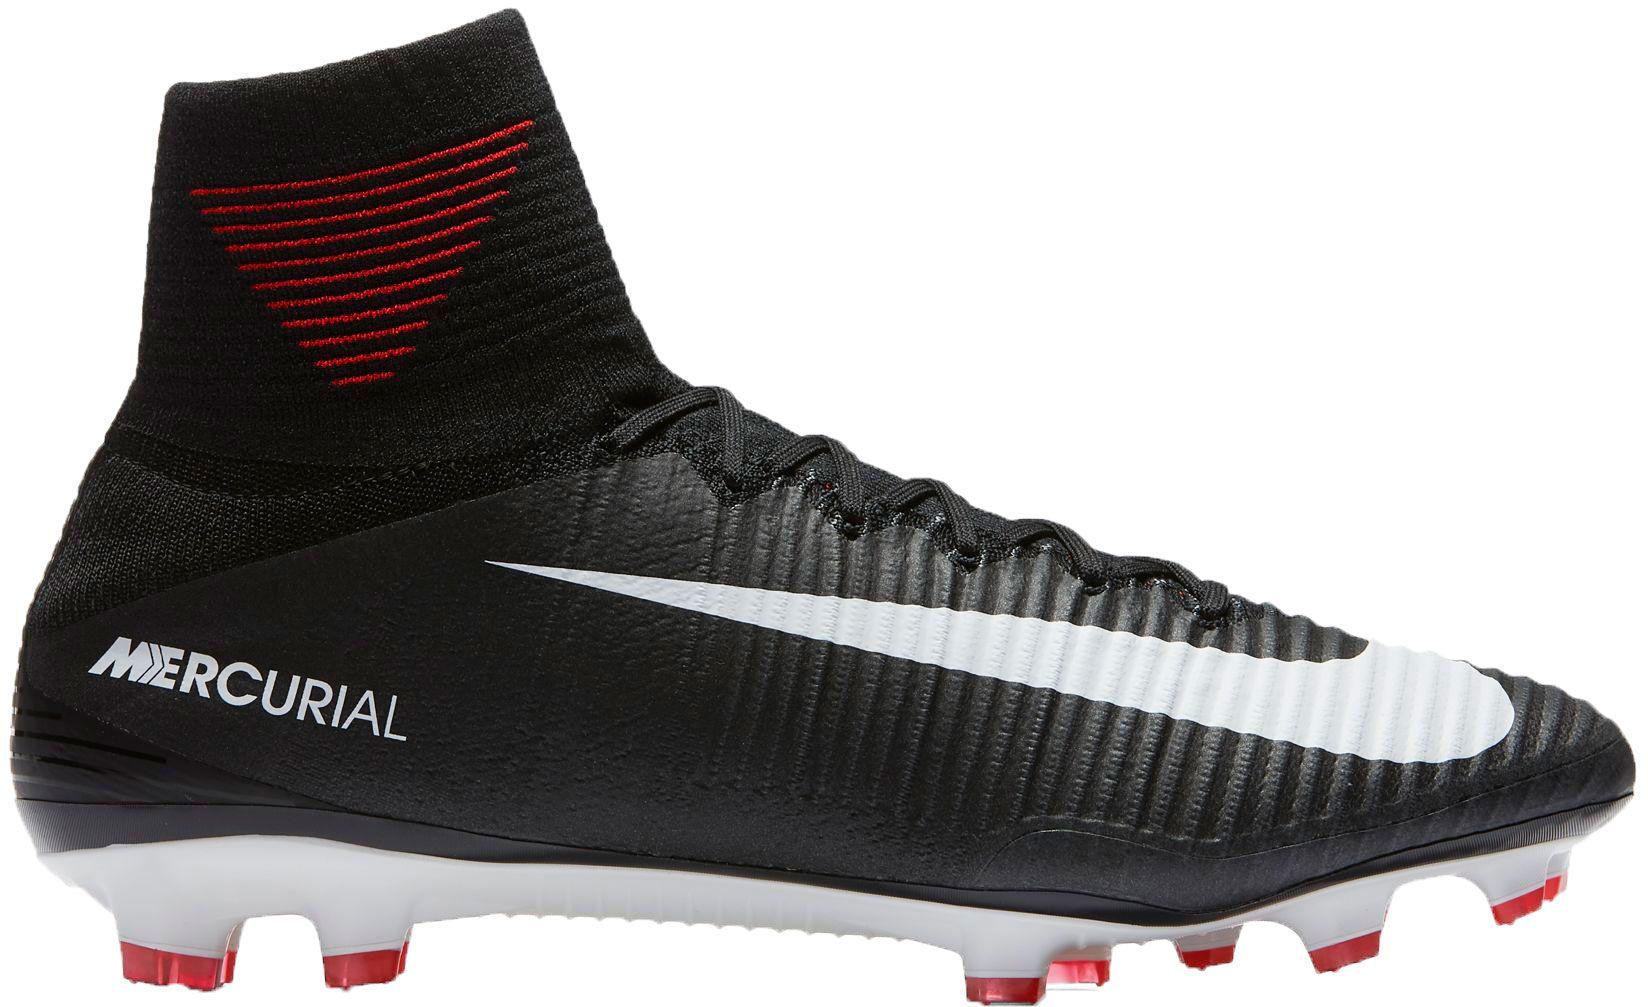 huge discount ec04a c8df2 ... Product Image · Nike Men s Mercurial Superfly V FG Soccer Cleats  Nike  Mercurial Vapor 10 (Liquid Chrome ...